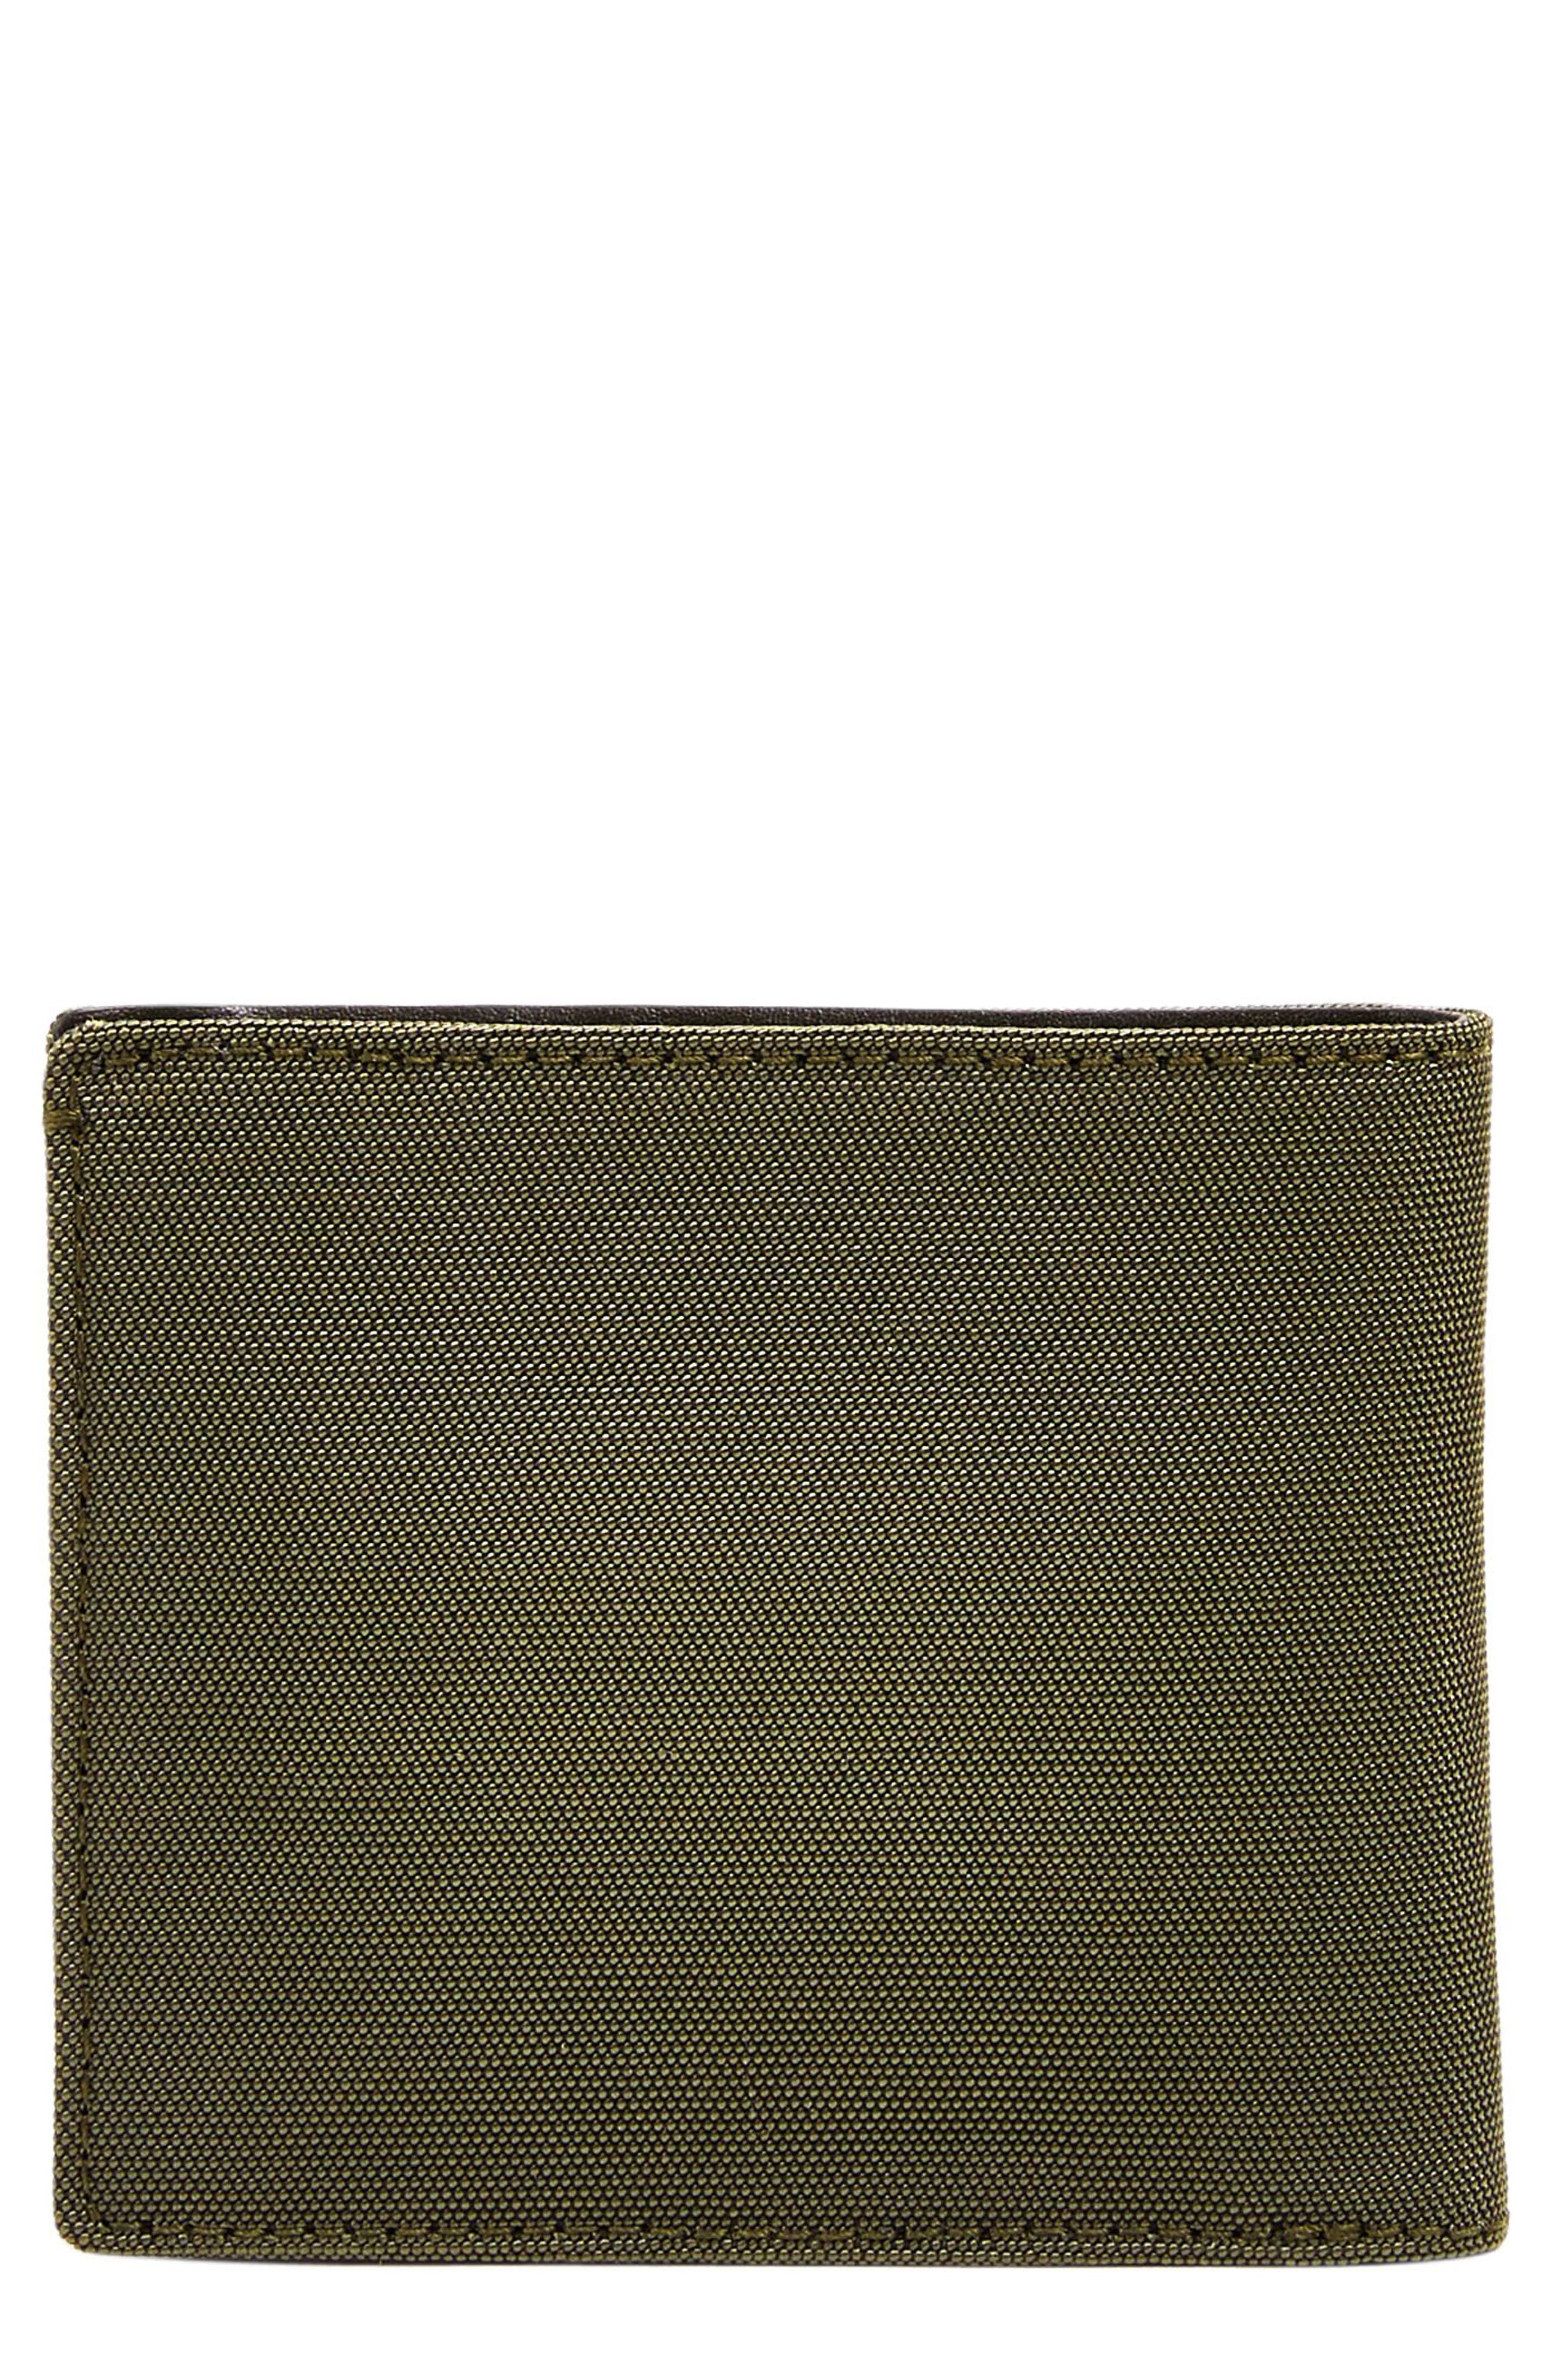 Passcase Wallet,                         Main,                         color, Dark Green